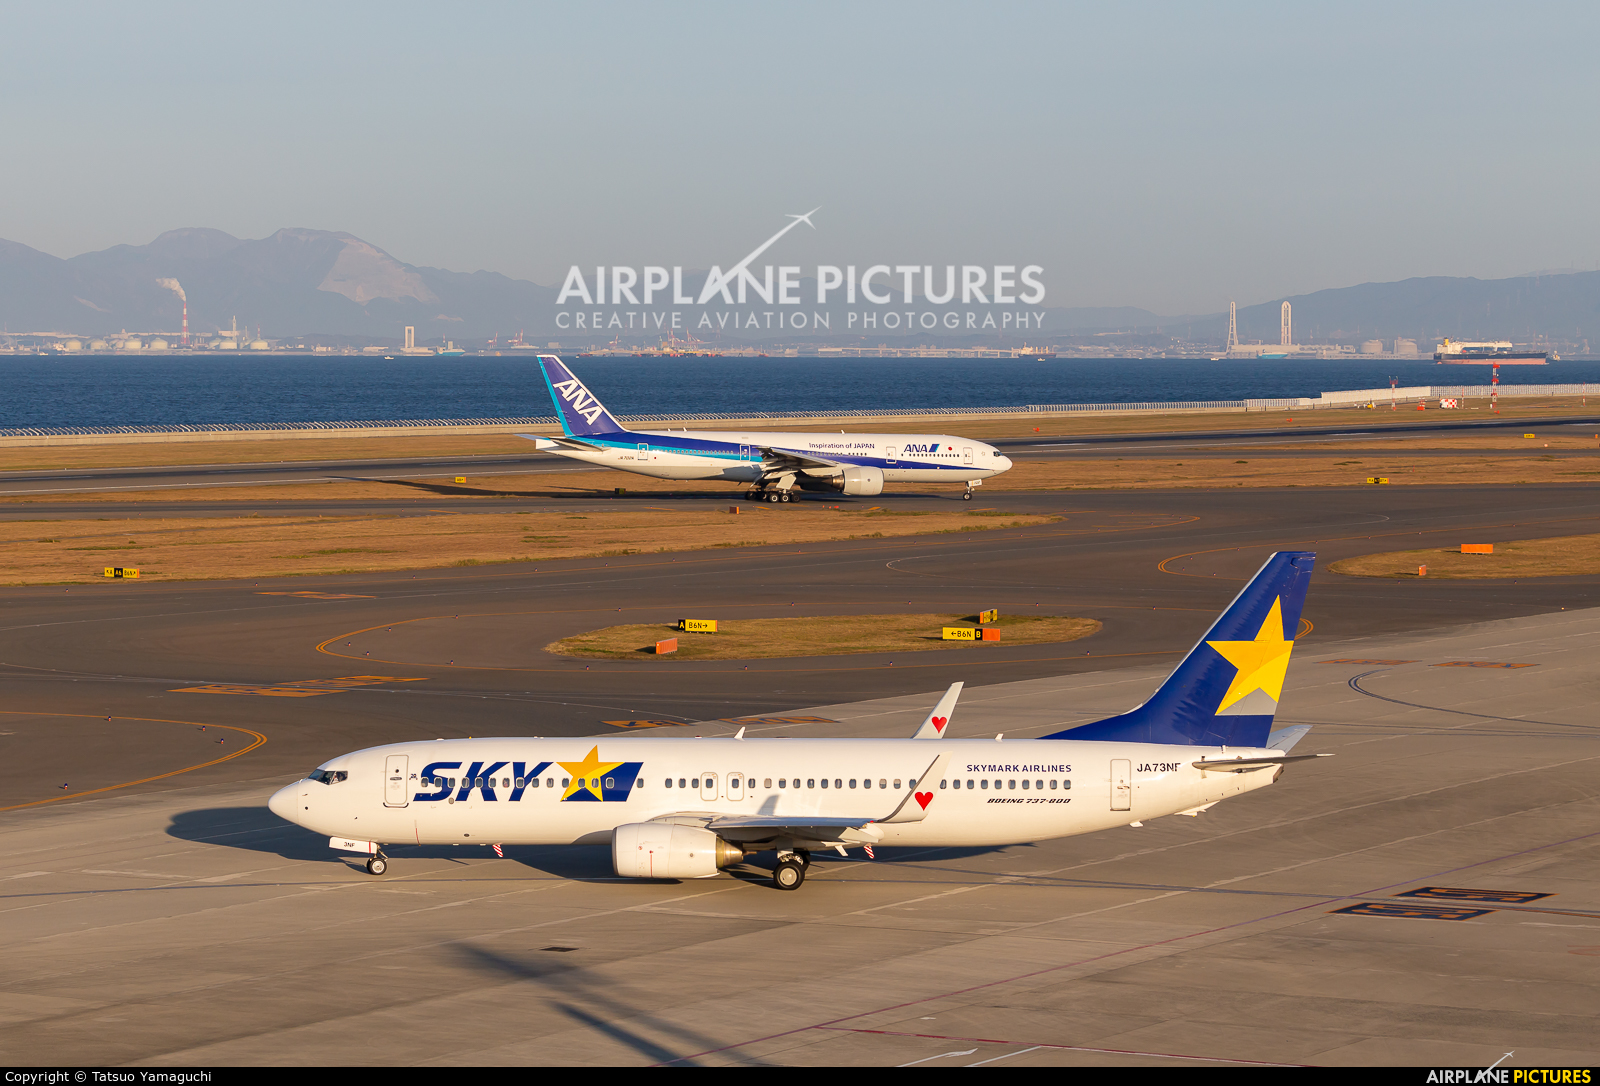 Skymark Airlines JA73NF aircraft at Chubu Centrair Intl